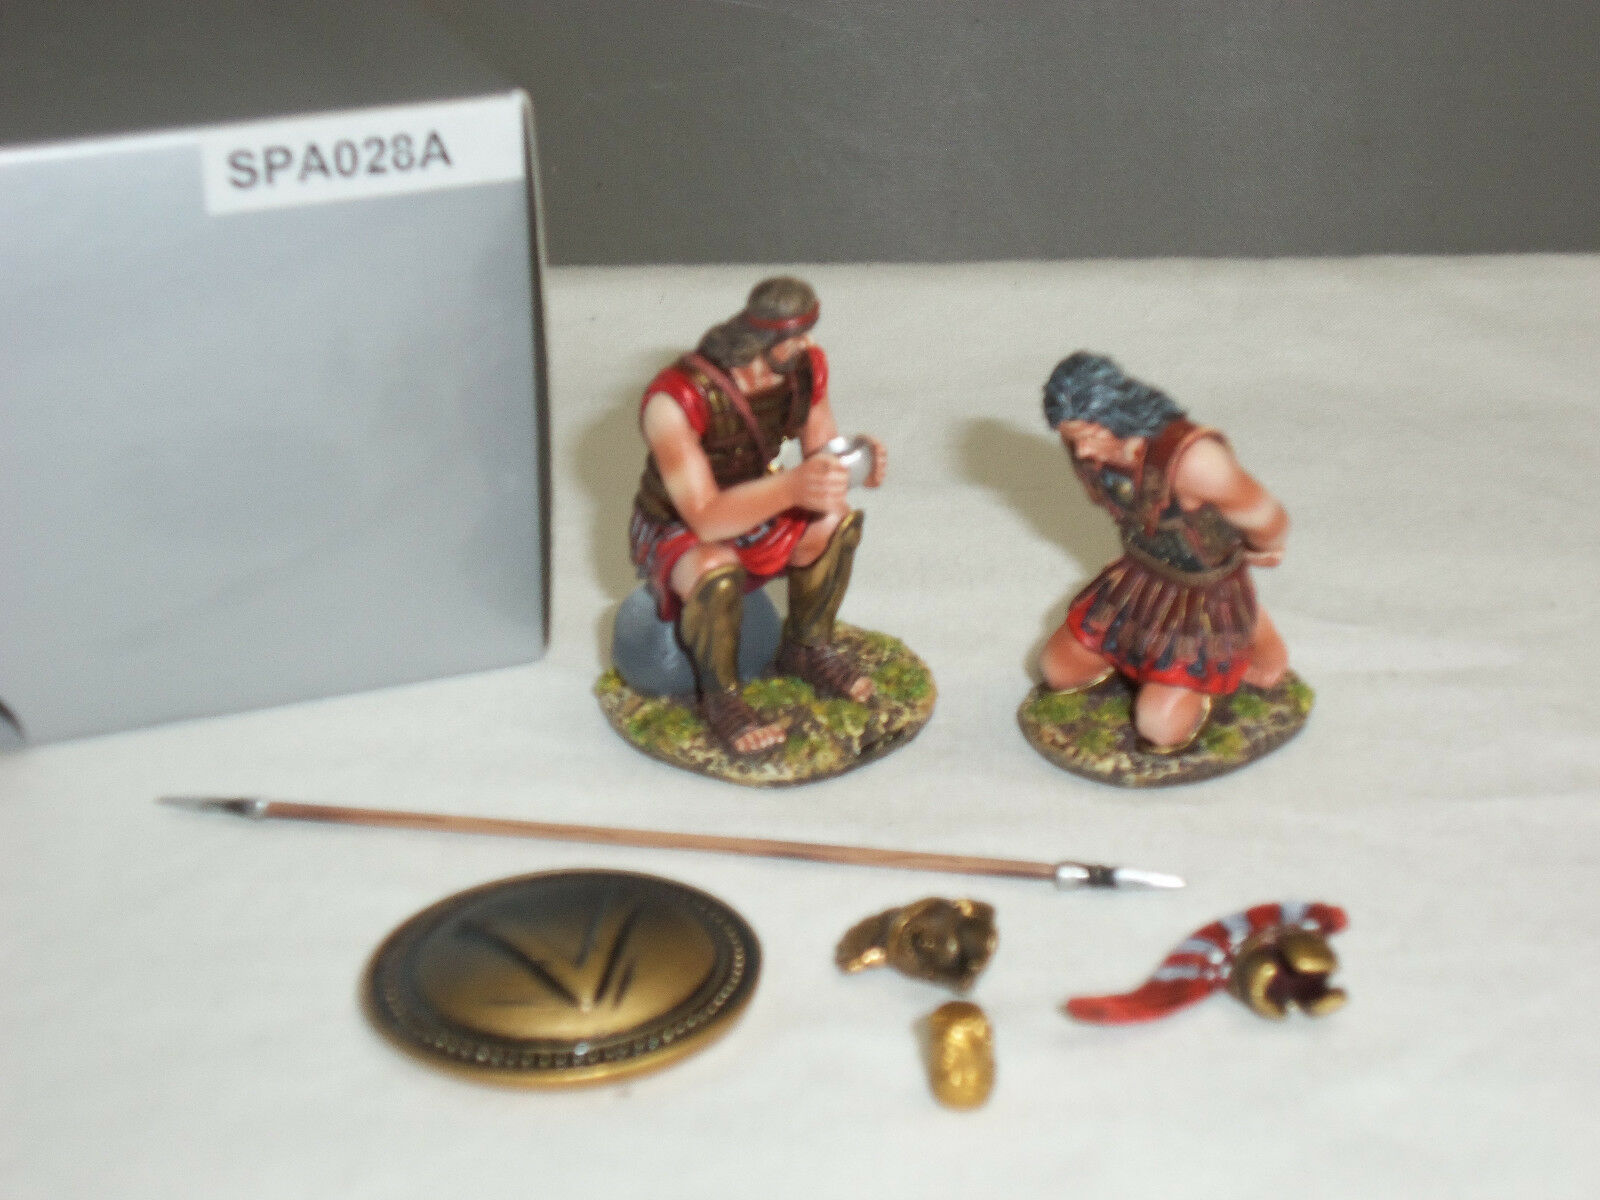 THOMAS GUNN SPA028A SPARTANS PRISONER WITH LAMBDA SHIELD METAL TOY SOLDIER SER